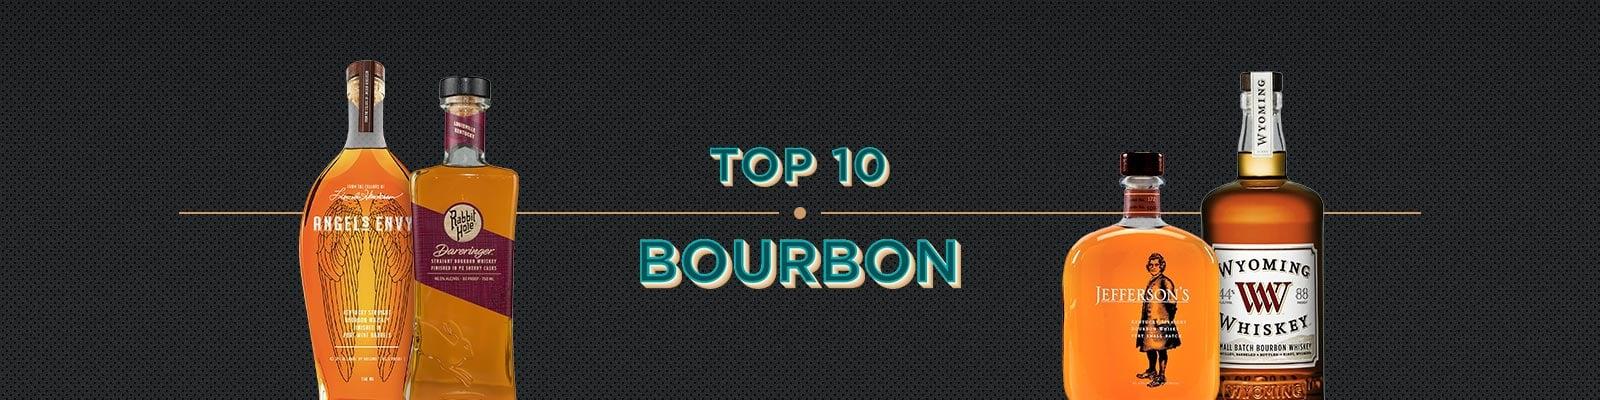 Top 10 Bourbon